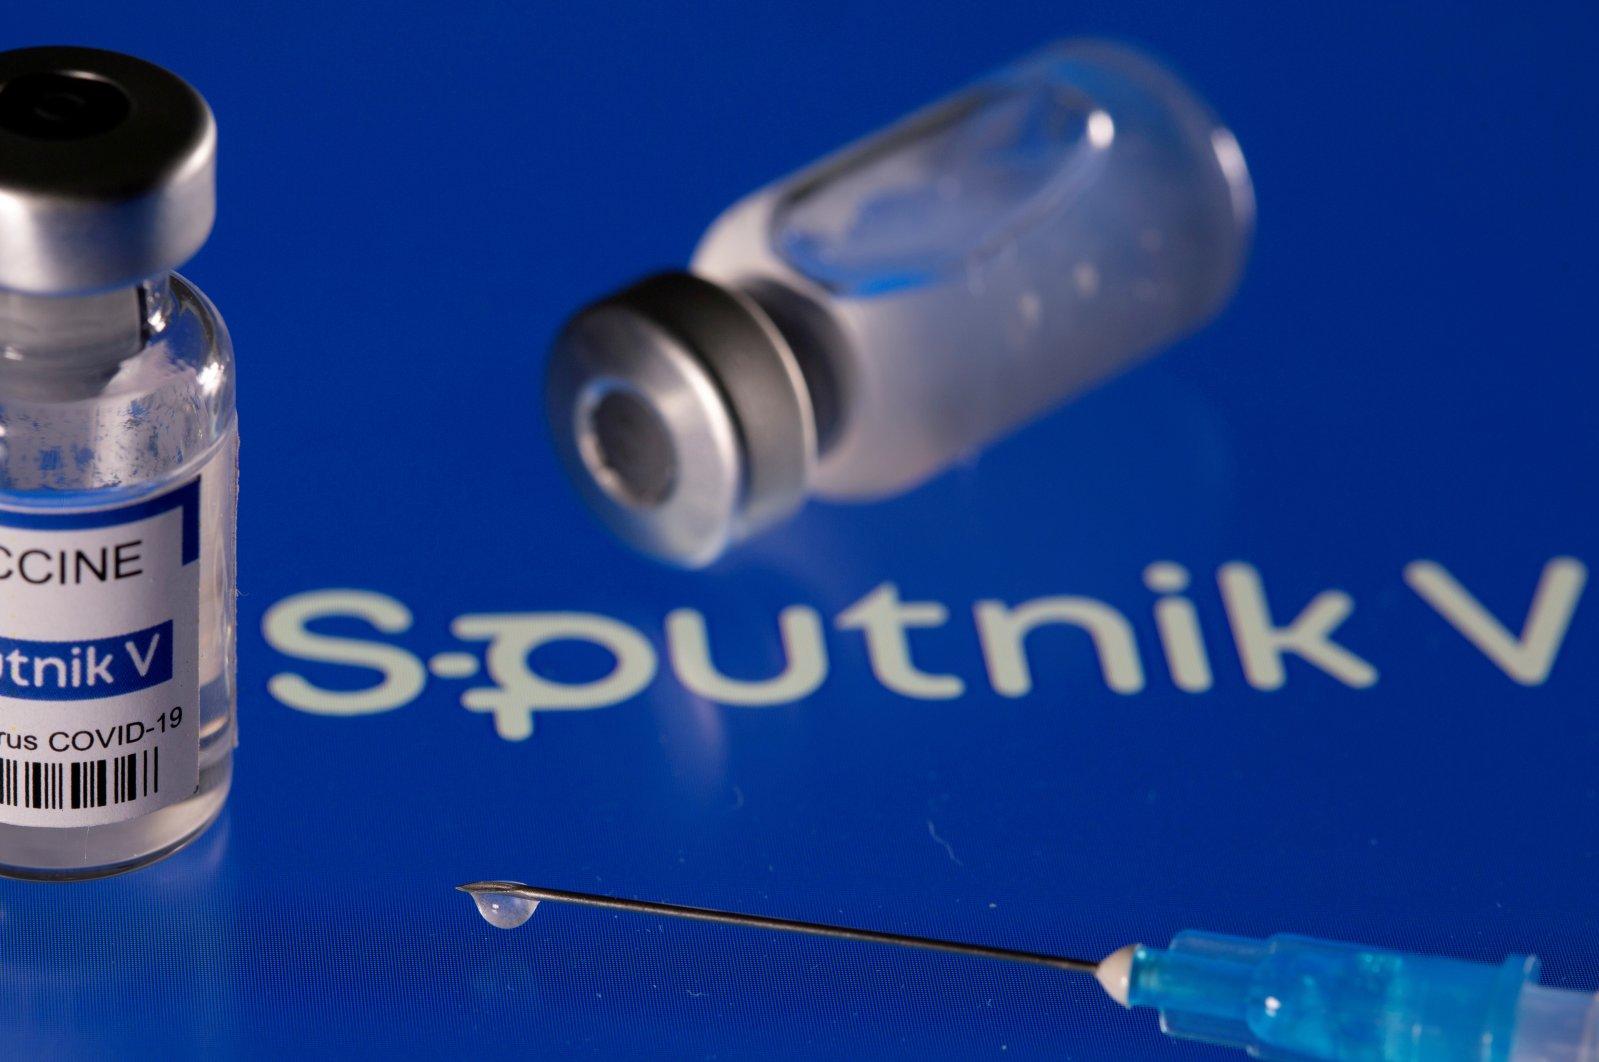 A file photo of the Sputnik V COVID-19 vaccine, March 24, 2021. (Reuters Photo)